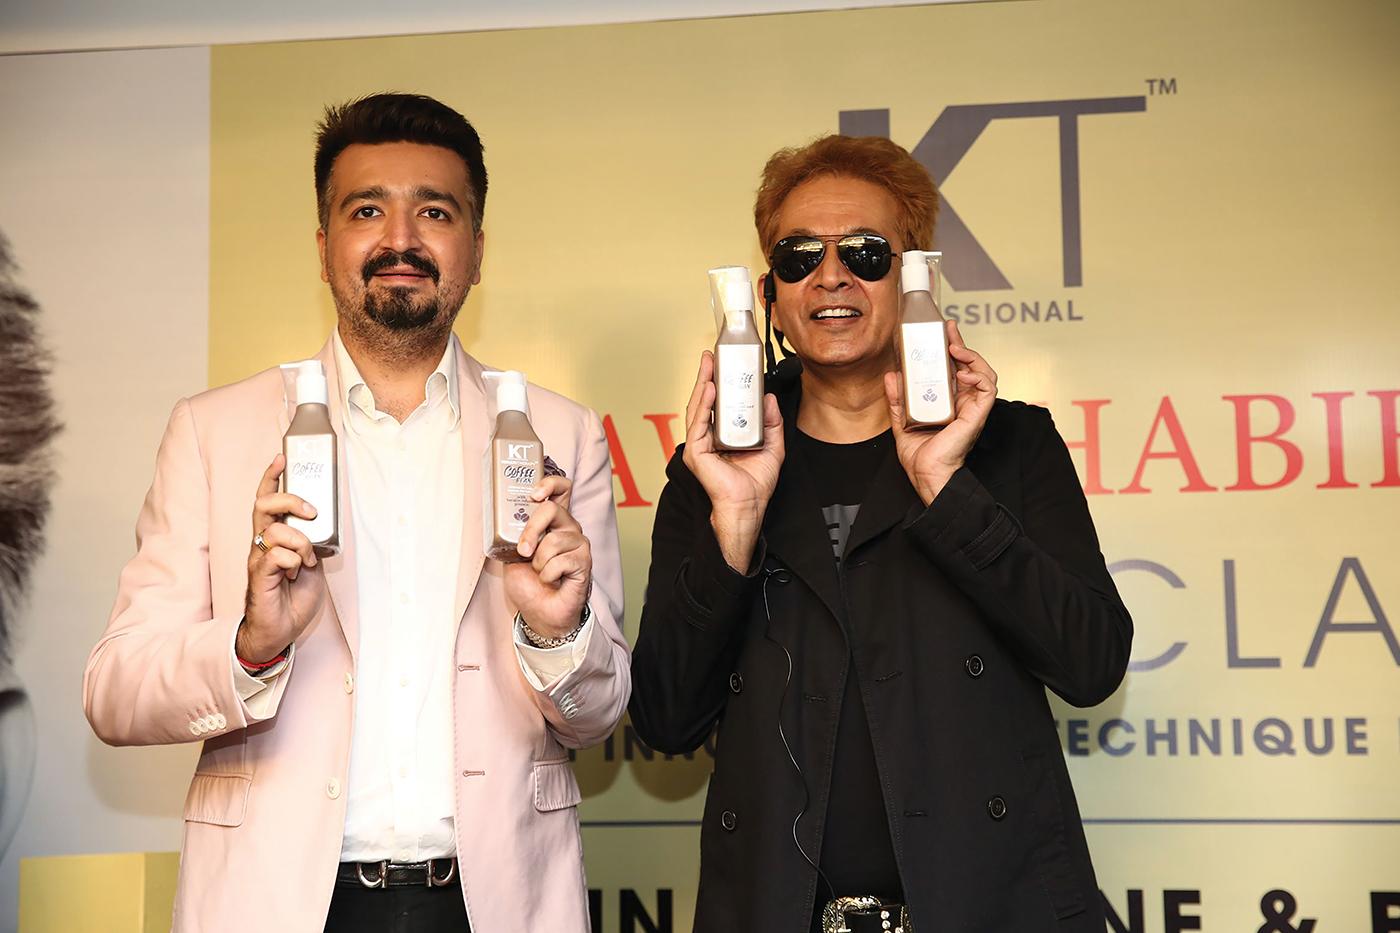 Jawed Habib signed as KT Professional's Brand Ambassador